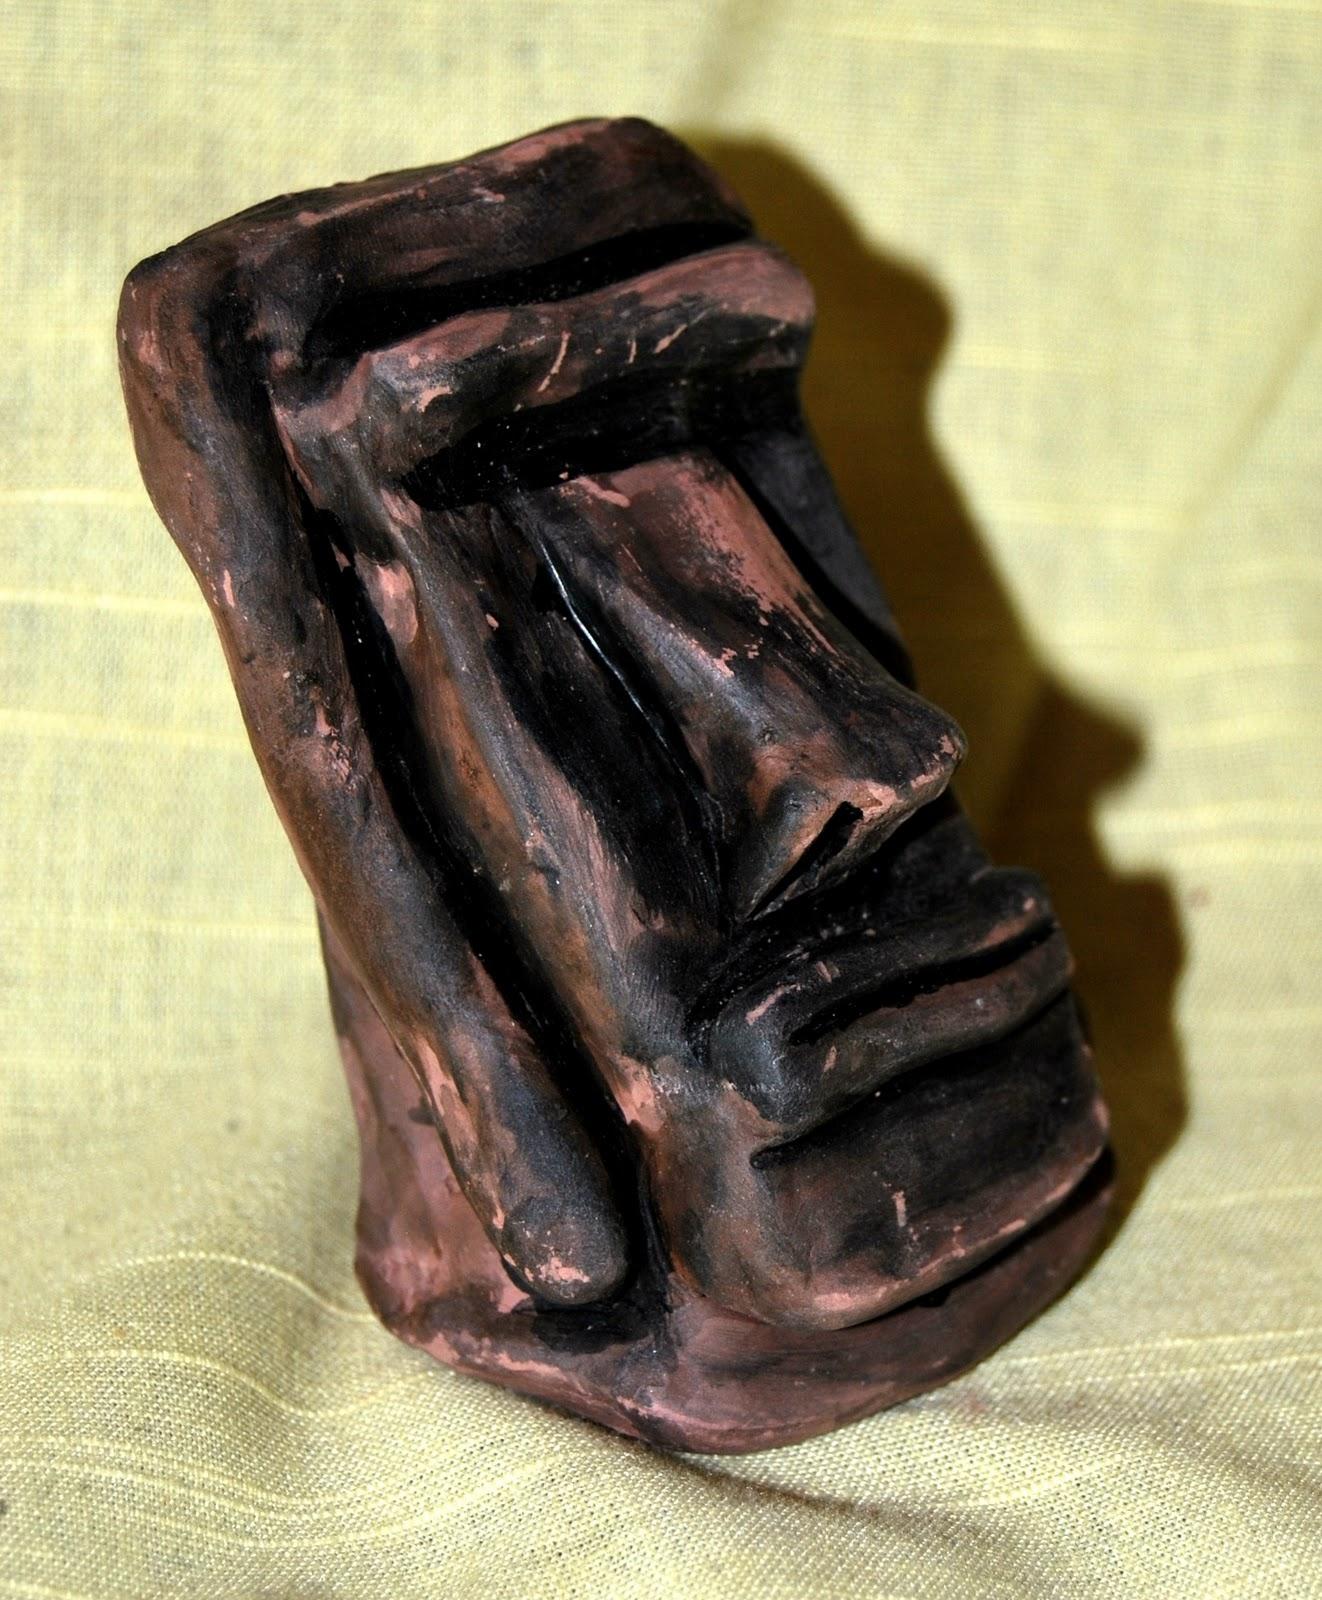 http://4.bp.blogspot.com/-1pFL5wVmDaQ/Tn7b0mKde5I/AAAAAAAAAFg/BQ8wOkxaOAg/s1600/3D+Art+-+Moai.JPG